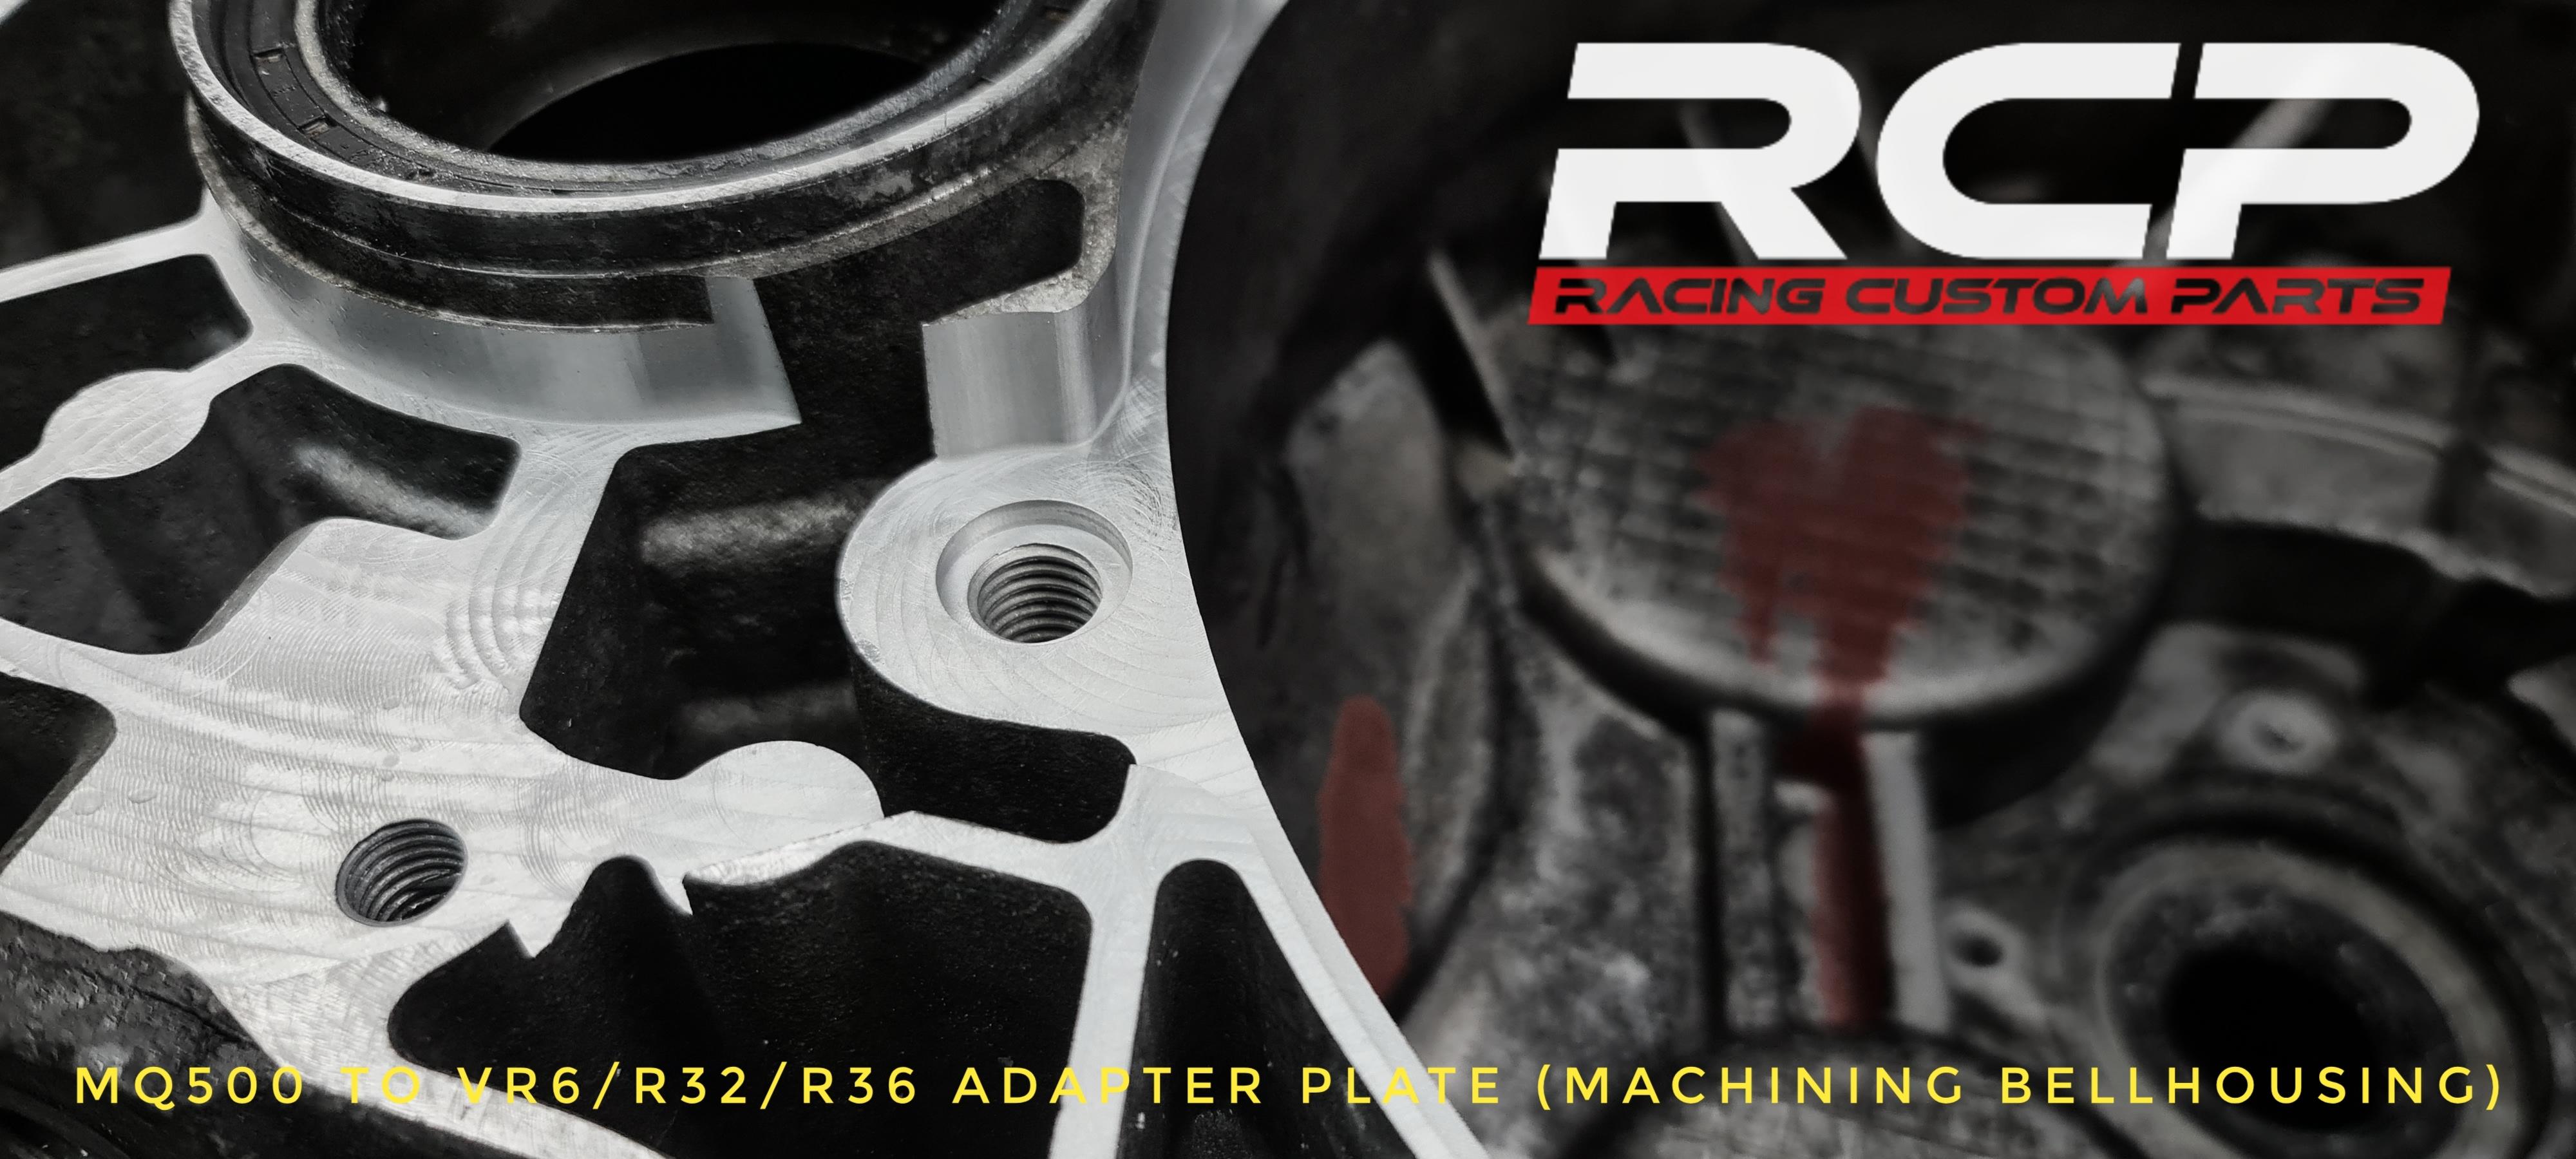 mq500 r32 adapter plate machining bellhousing strong gearbox turbo r36 vr6 rcp racing custom parts billet cnc